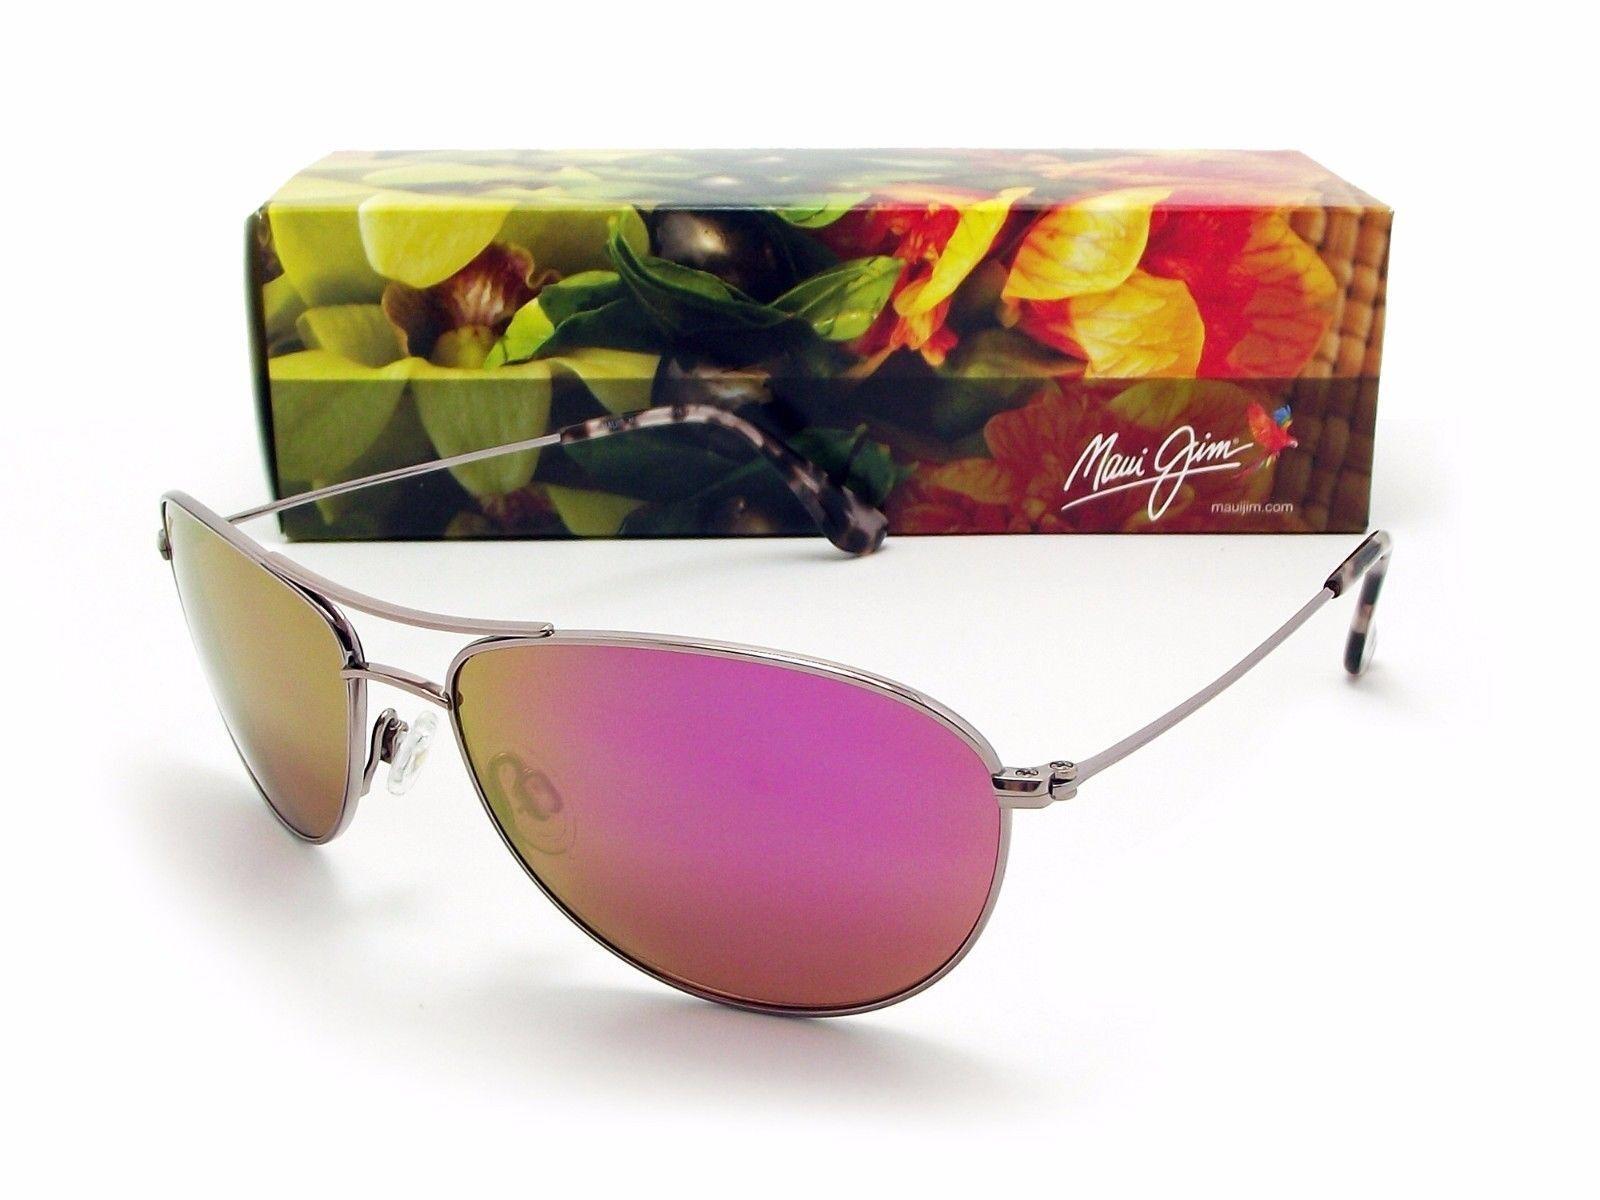 5186ef31ea1 Maui Jim Baby Beach 245 16pr Rose Gold   Pink Sunglasses for sale ...